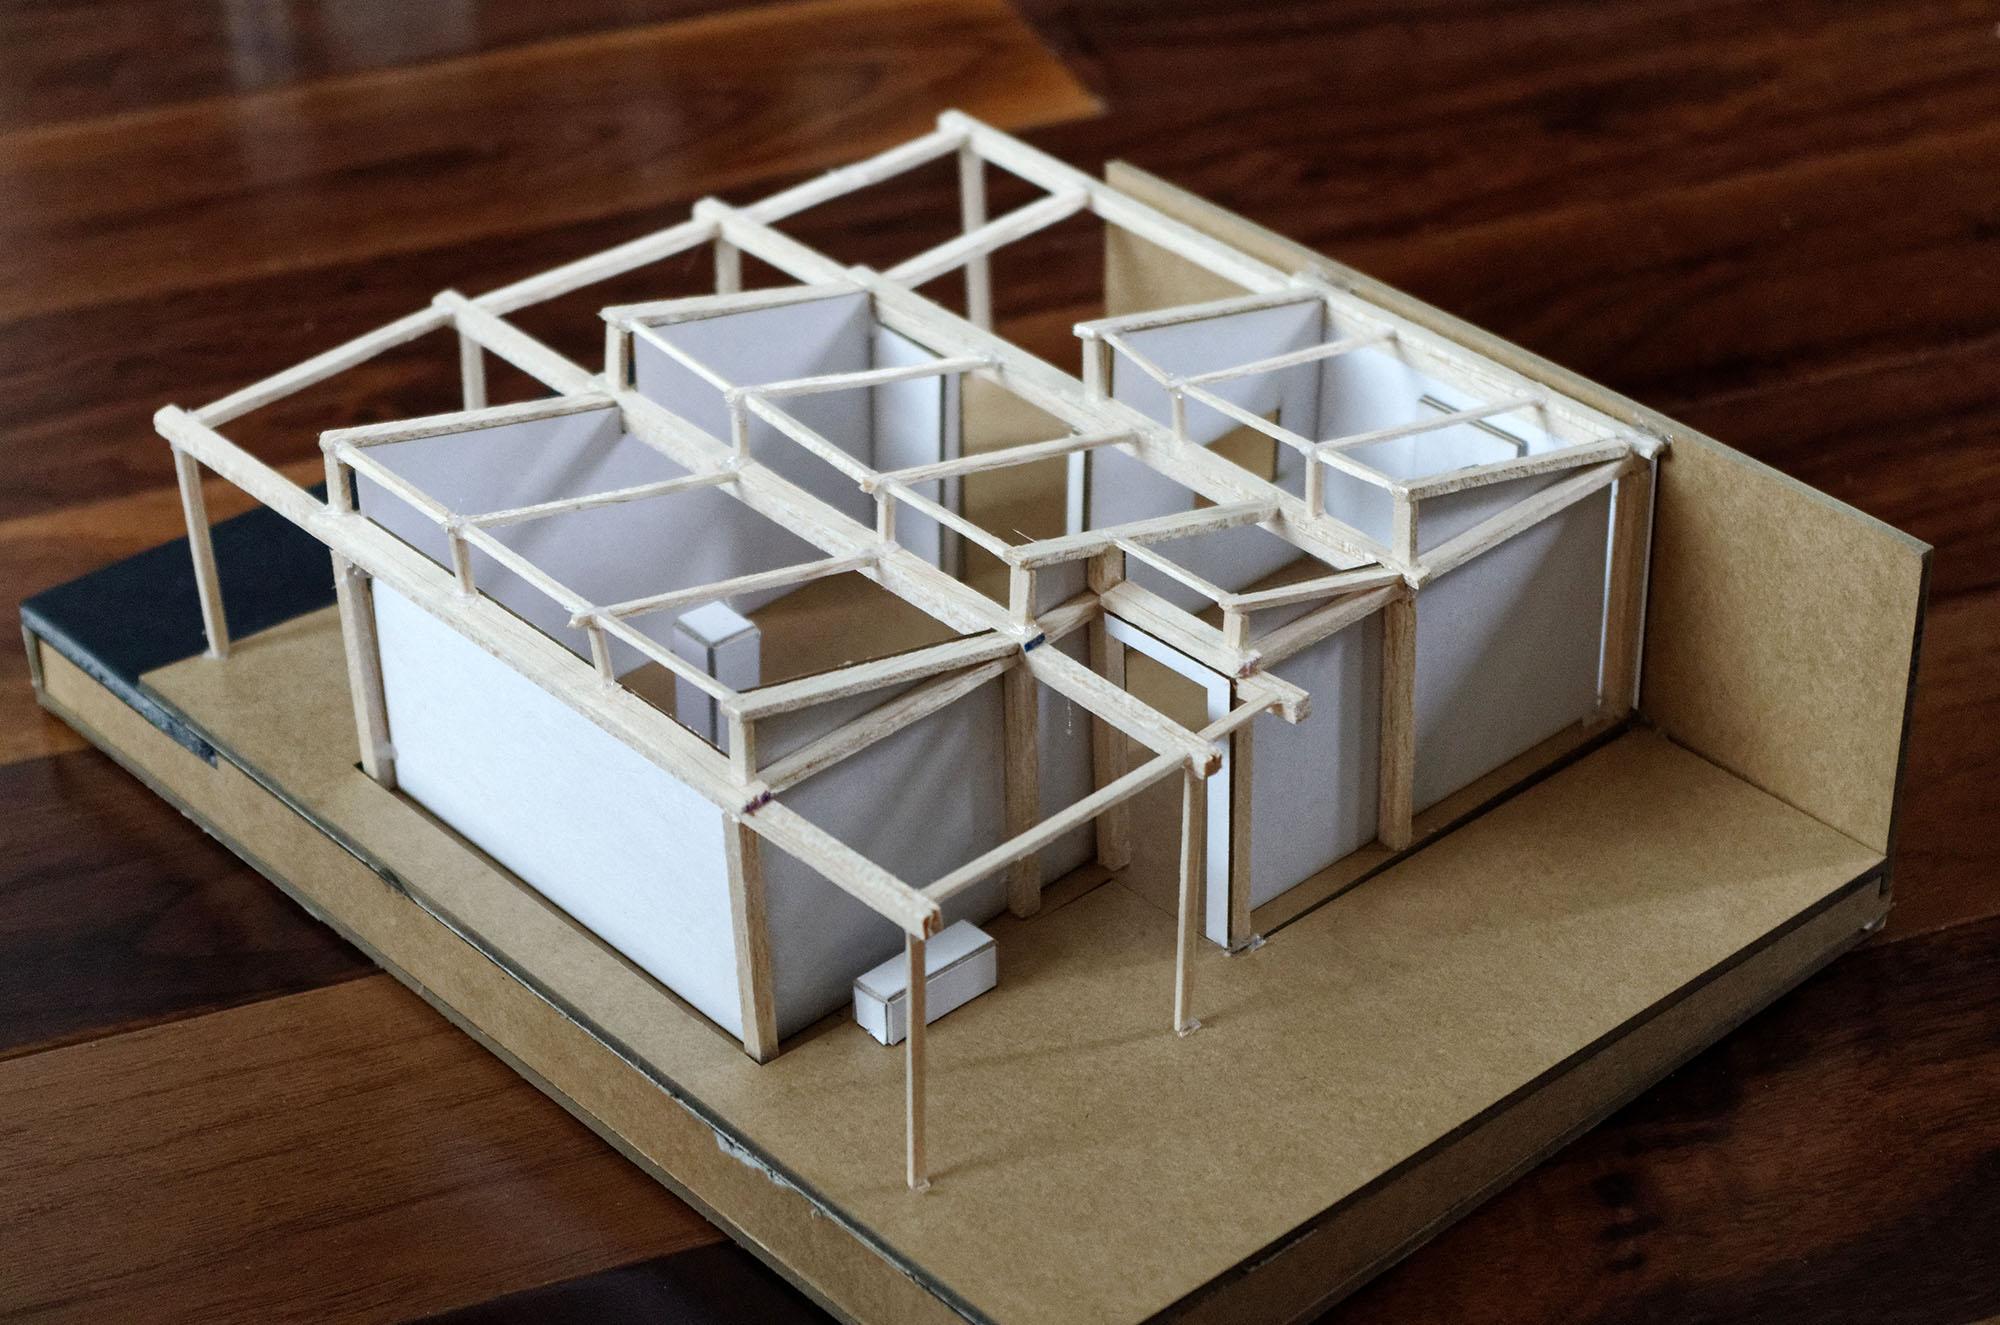 pavillon - maquette